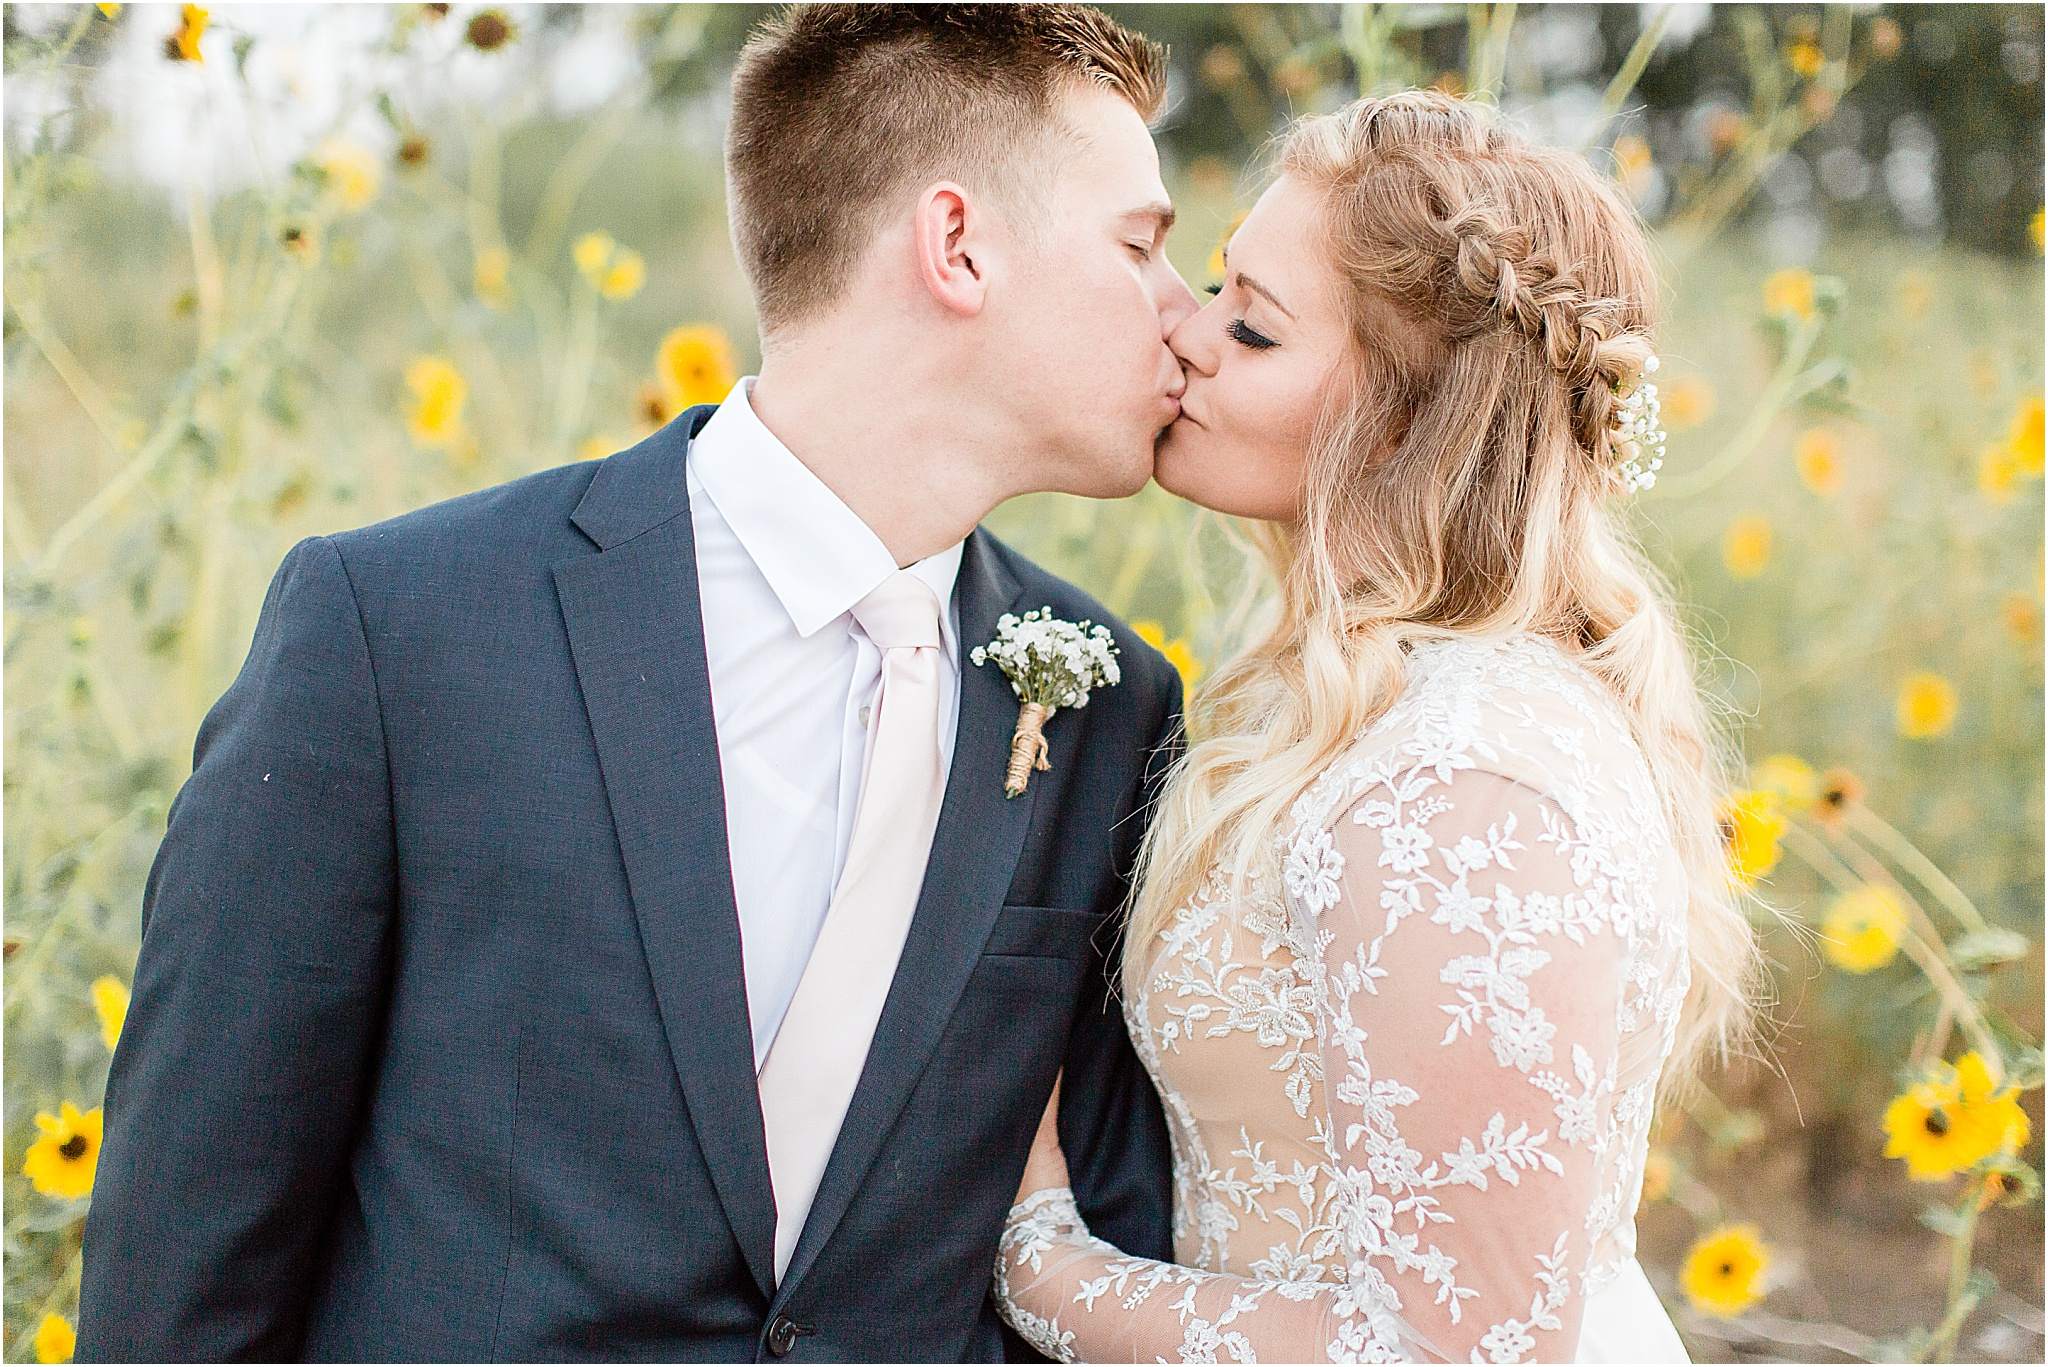 Wedding Photography_Meridian Idaho Temple_Boise Idaho_Nampa Idaho_Leah Southwick Photography_0029.jpg